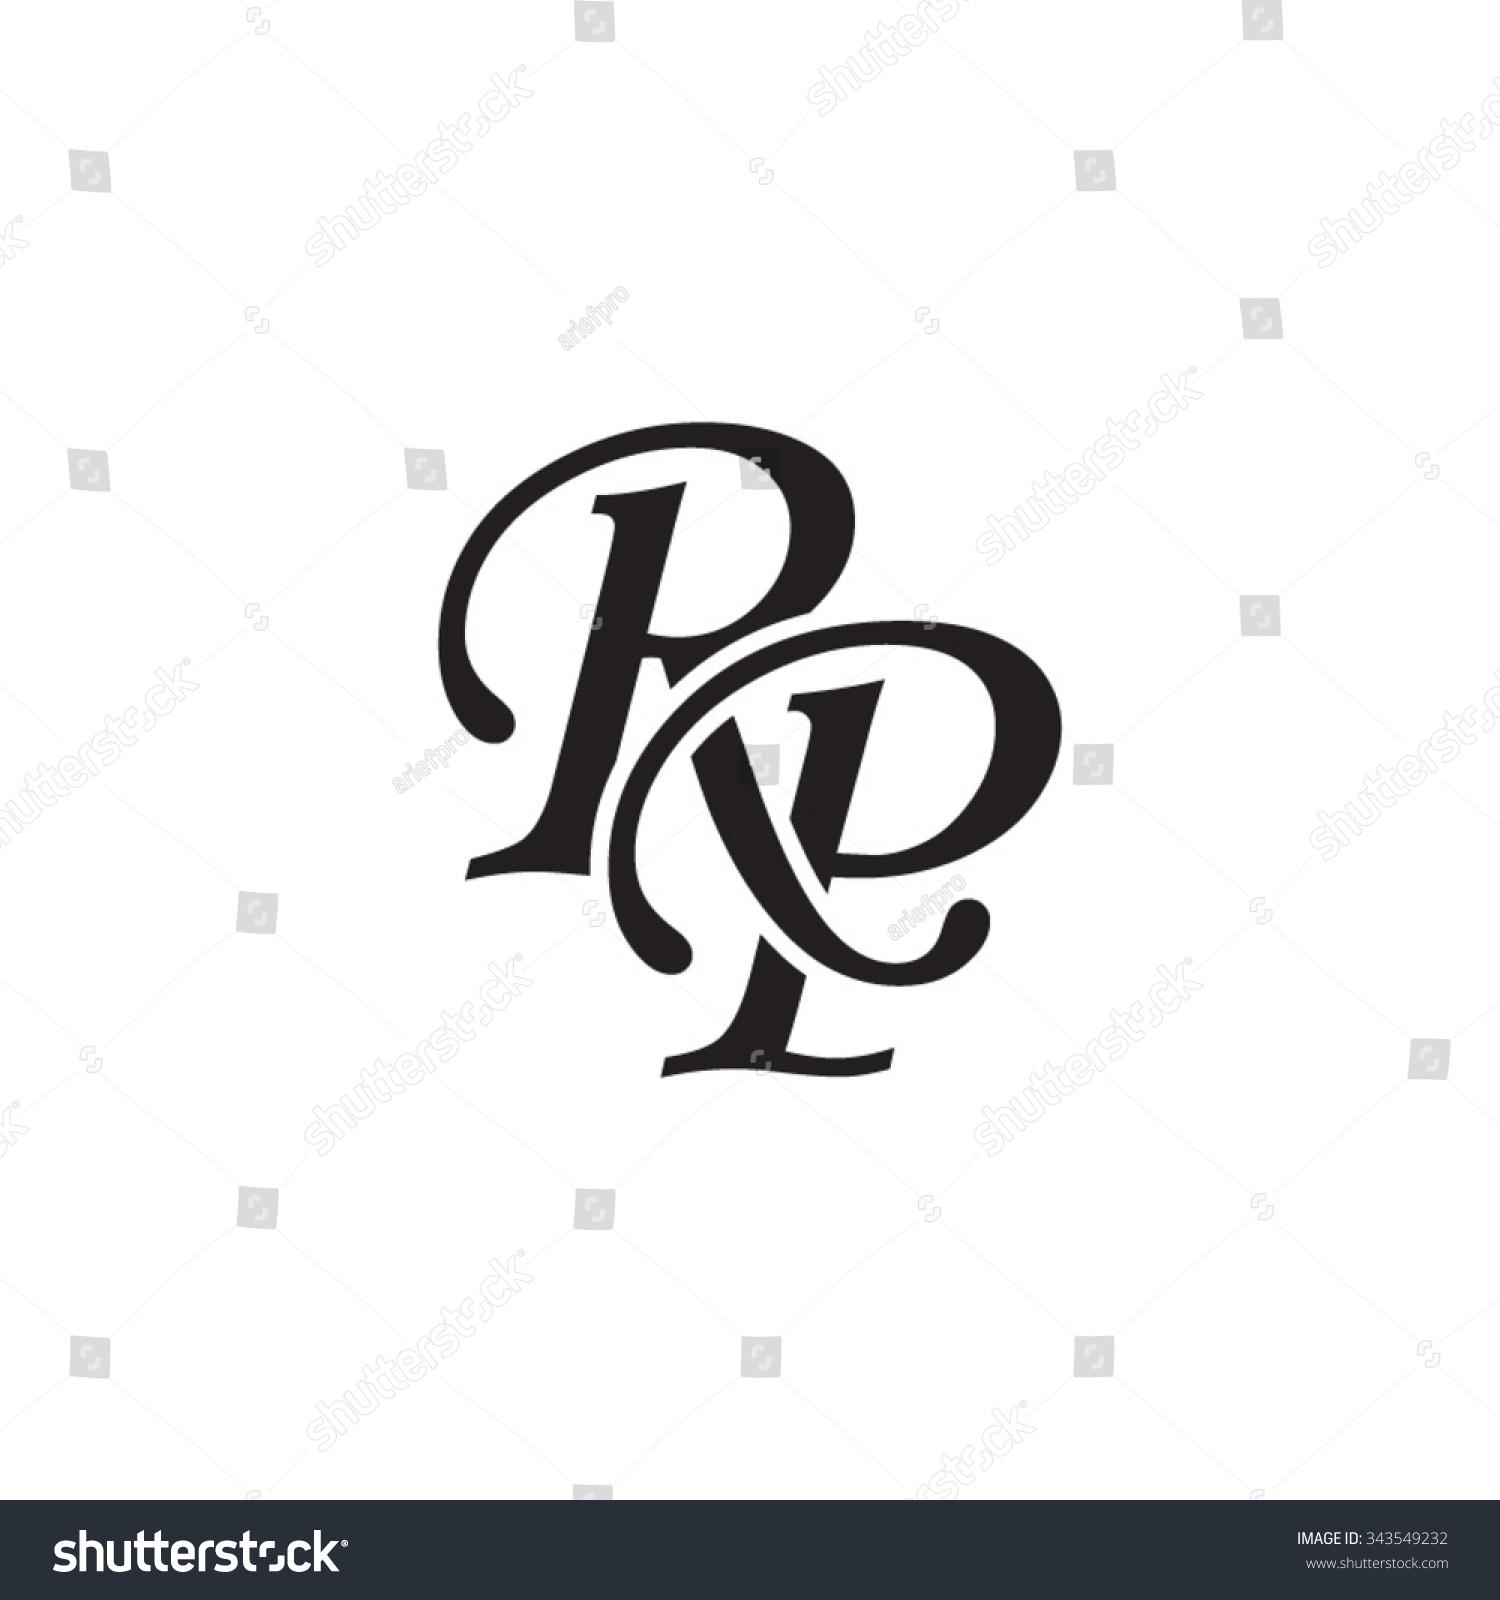 Rp Initial Monogram Lo...P Logo Name